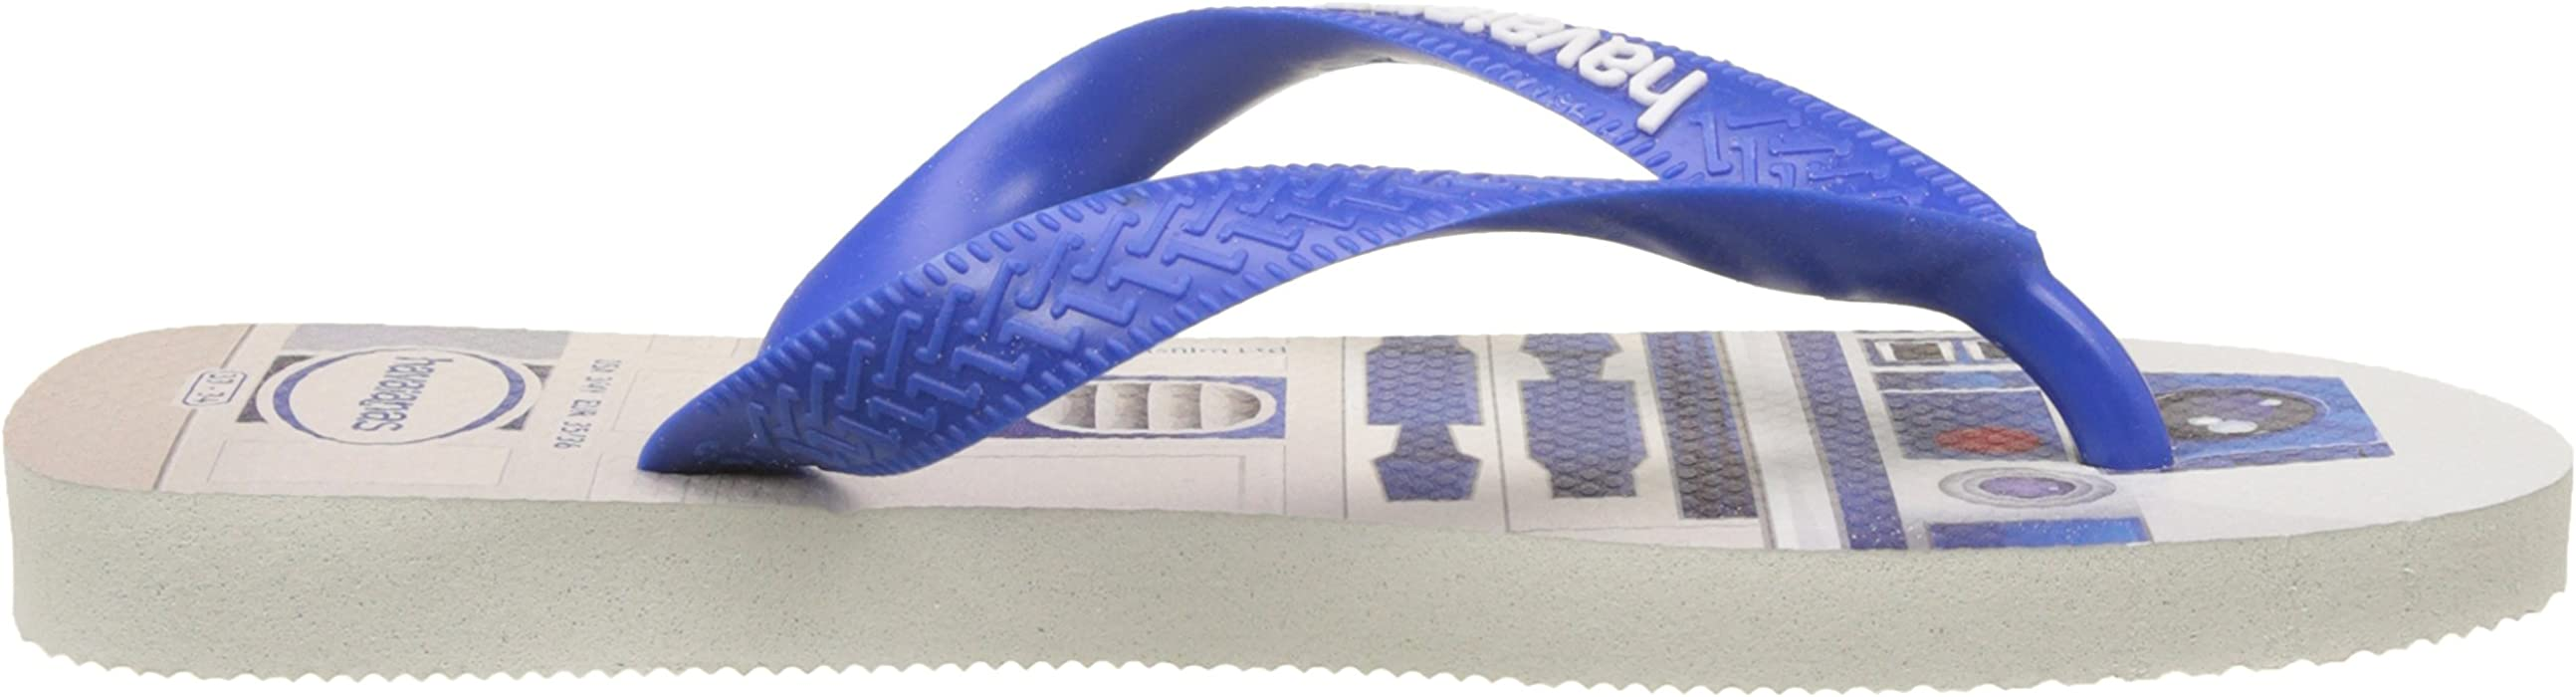 6697daec5 Havaianas Star Wars Flip Flops - White Blue UK 1213